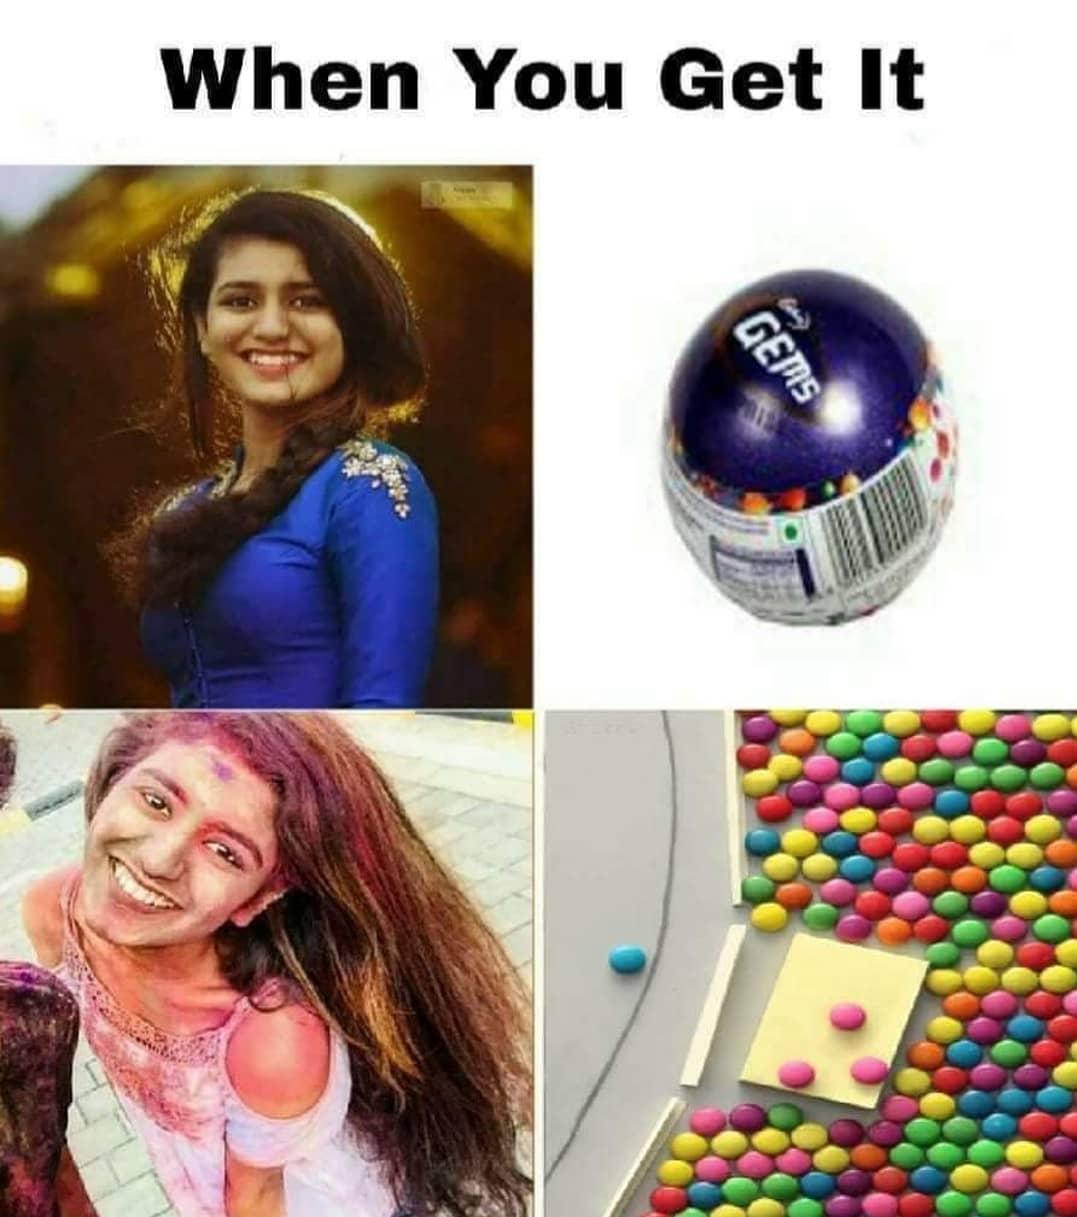 www-funny-memes-in-hindi-com-525-Dubal2-BMining2-BMemes2-B252822529